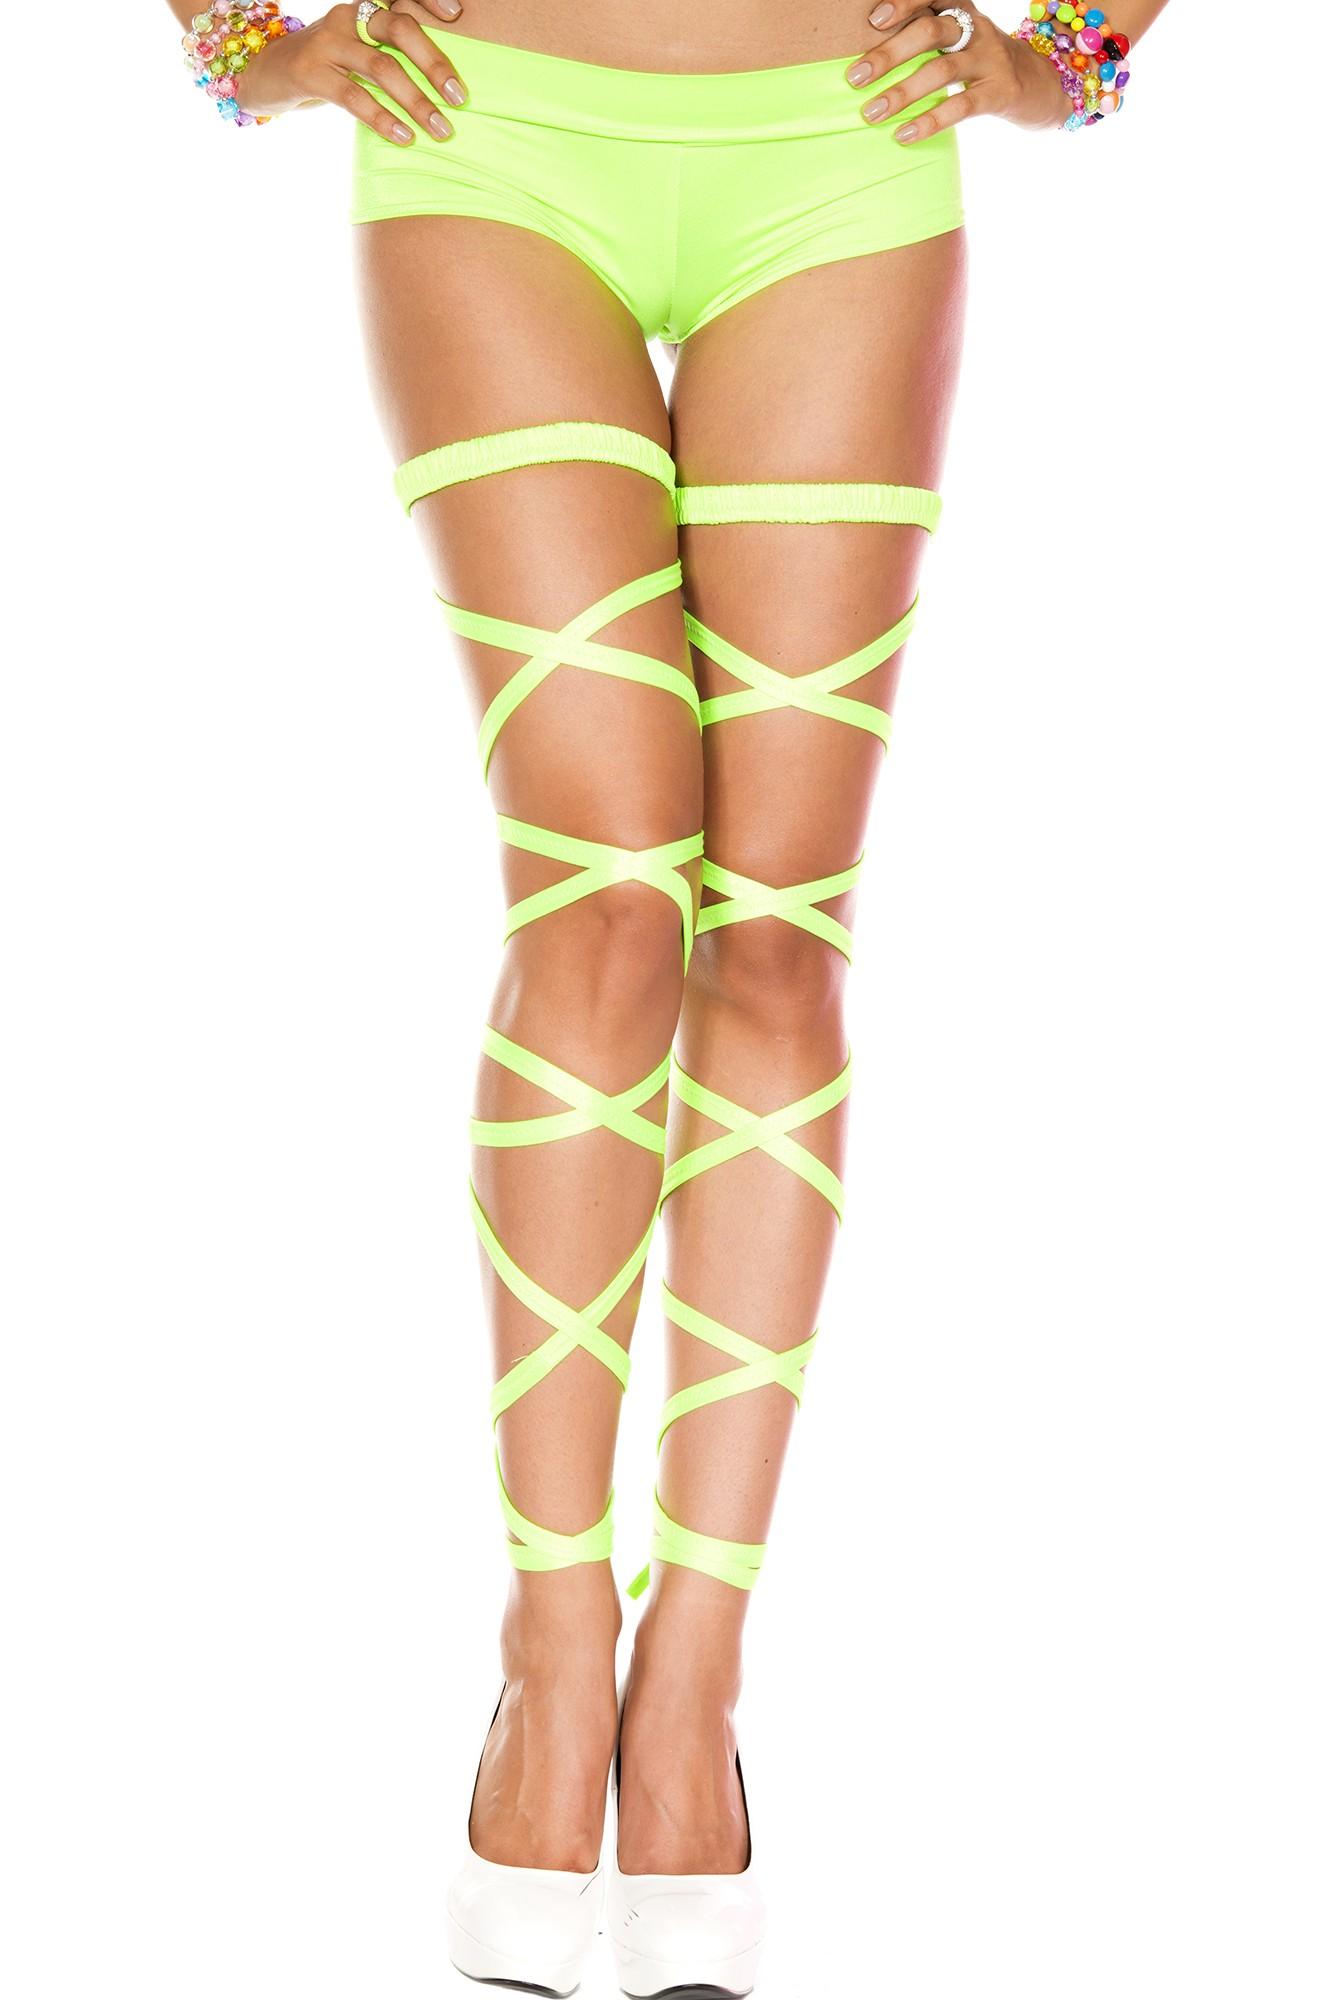 Leg wrap garter green 34004 Edmonton